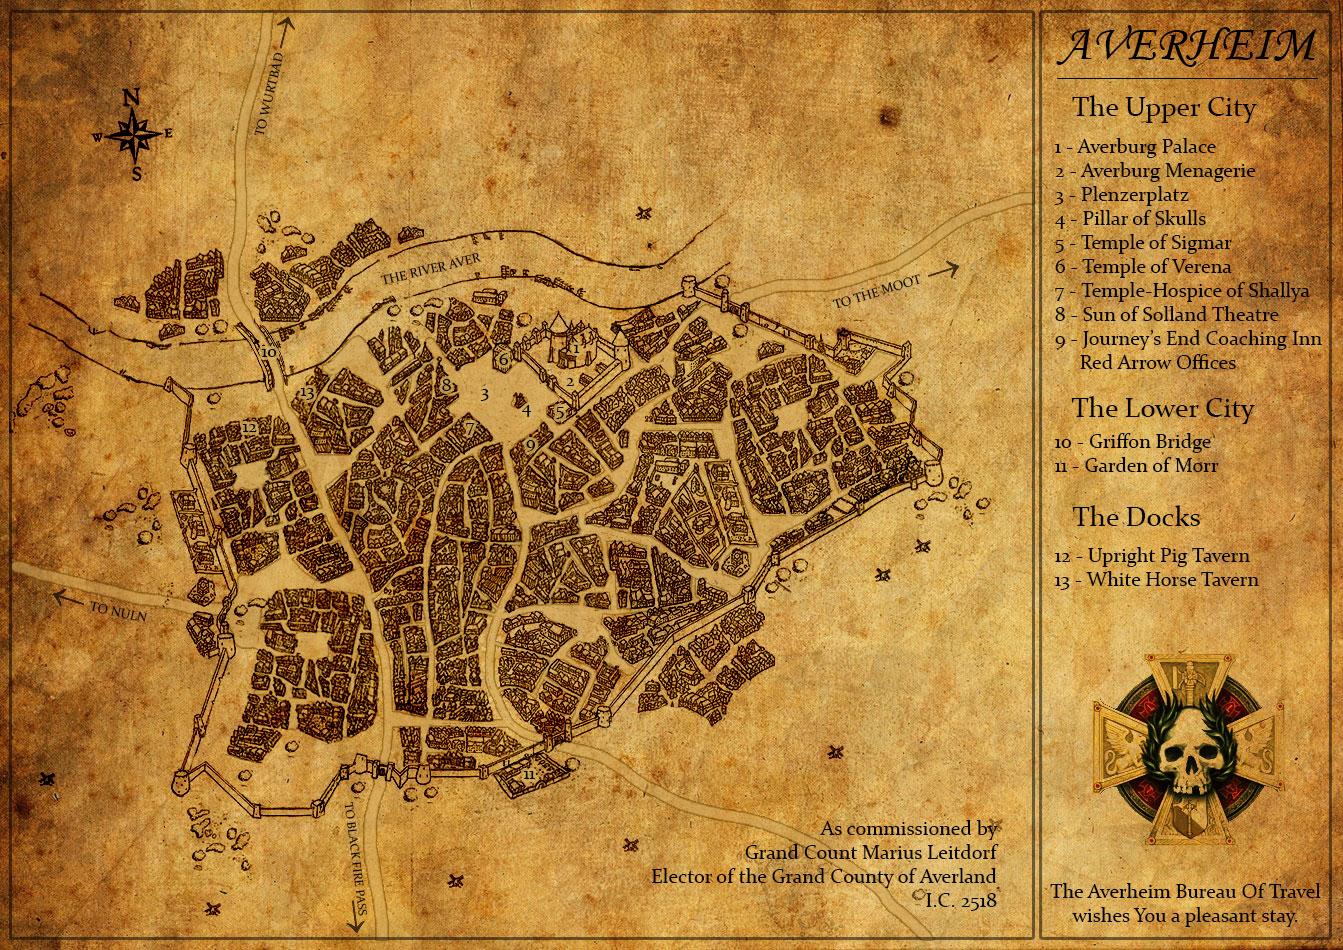 Image - Map-City-Averheim-1.jpg | Warhammer Wiki | FANDOM powered by ...